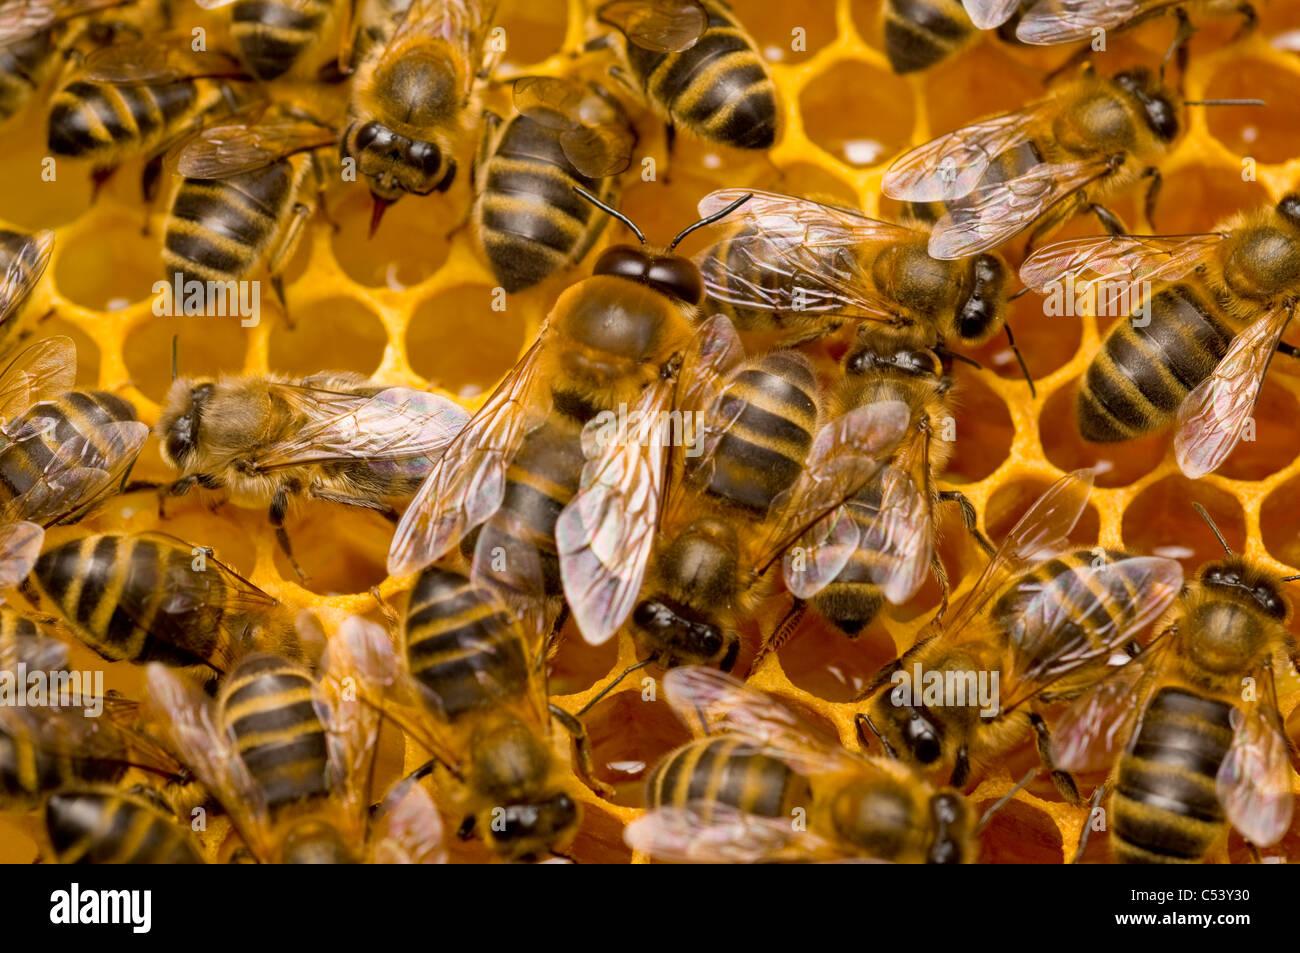 male drone honeybee Apis mellifera - Stock Image